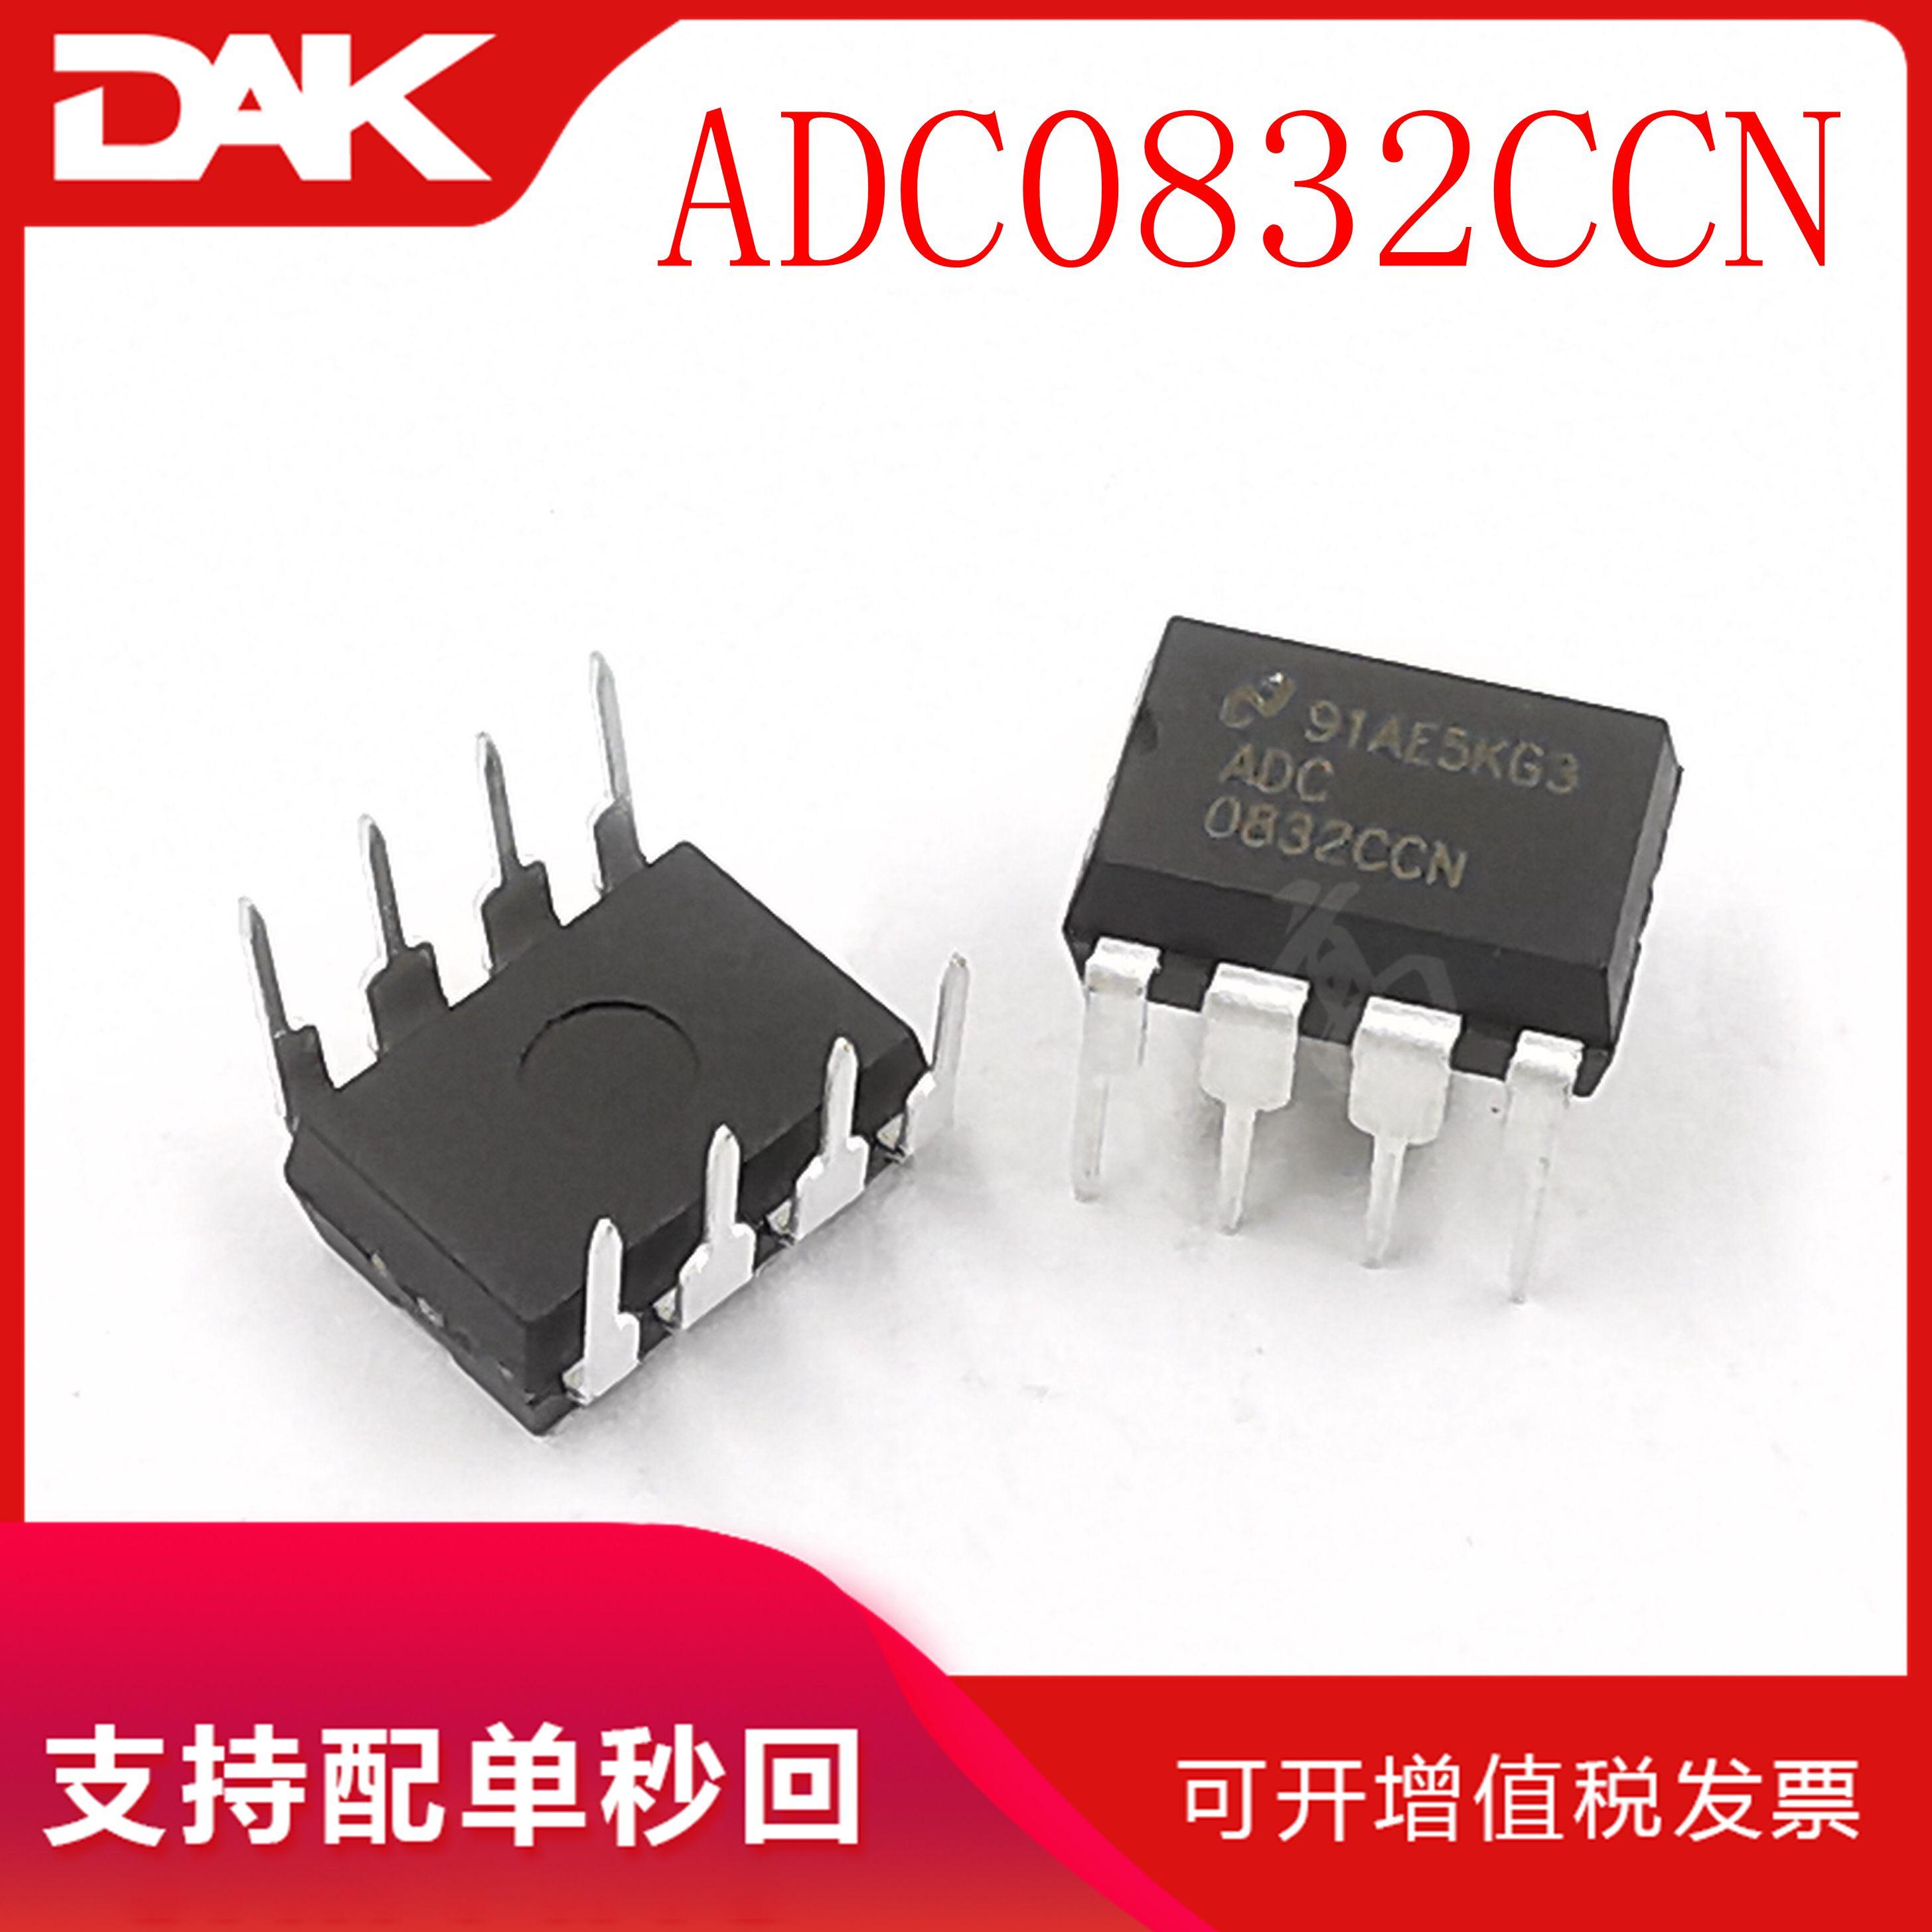 ADC0832CCN DIP-8 8位分辨率/双通道A/D 模数转换器 可提供发票